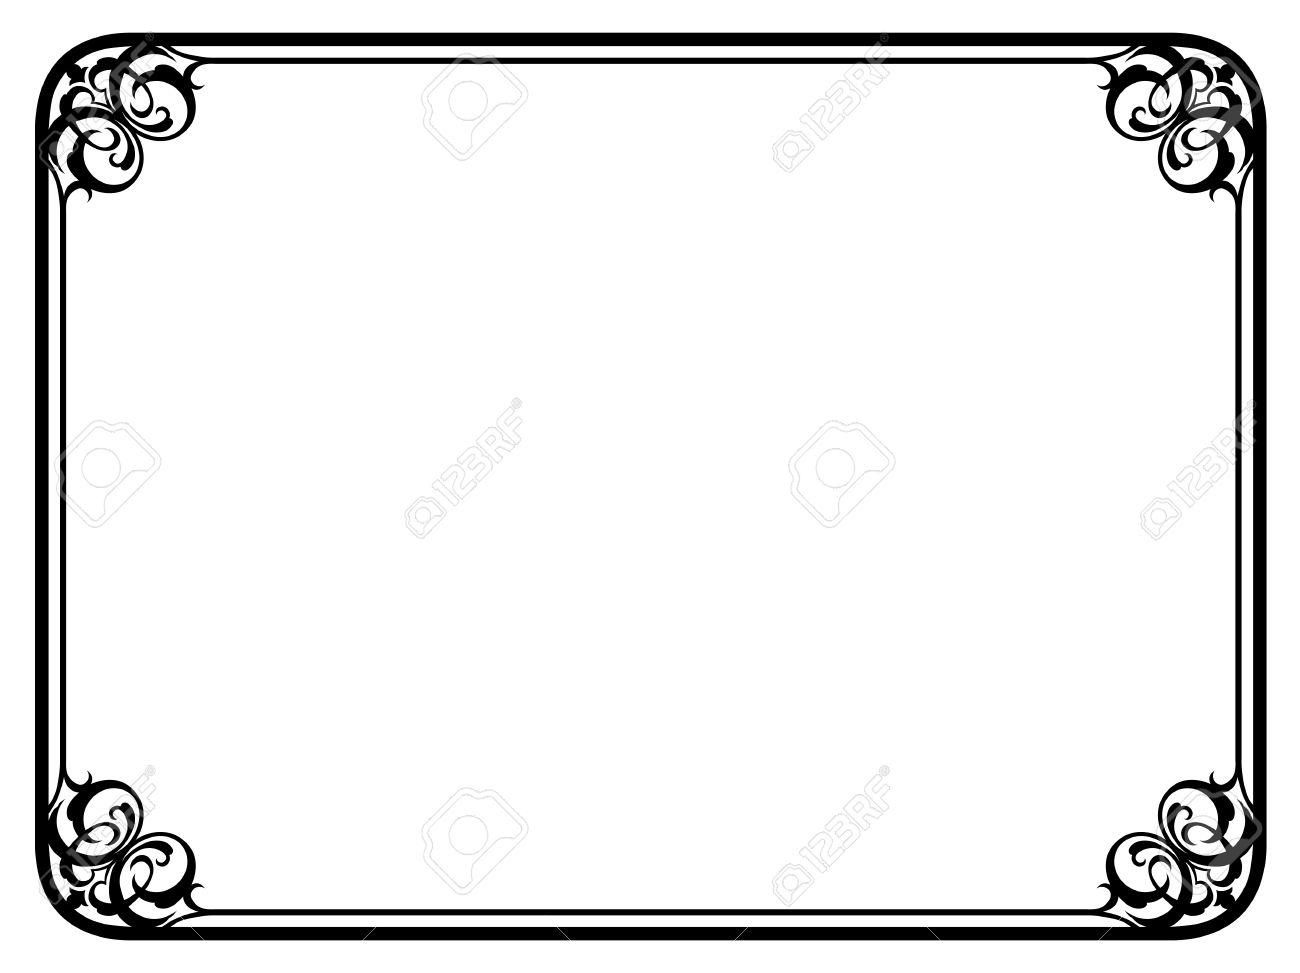 Vector simple black calligraph ornamental decorative frame pattern.